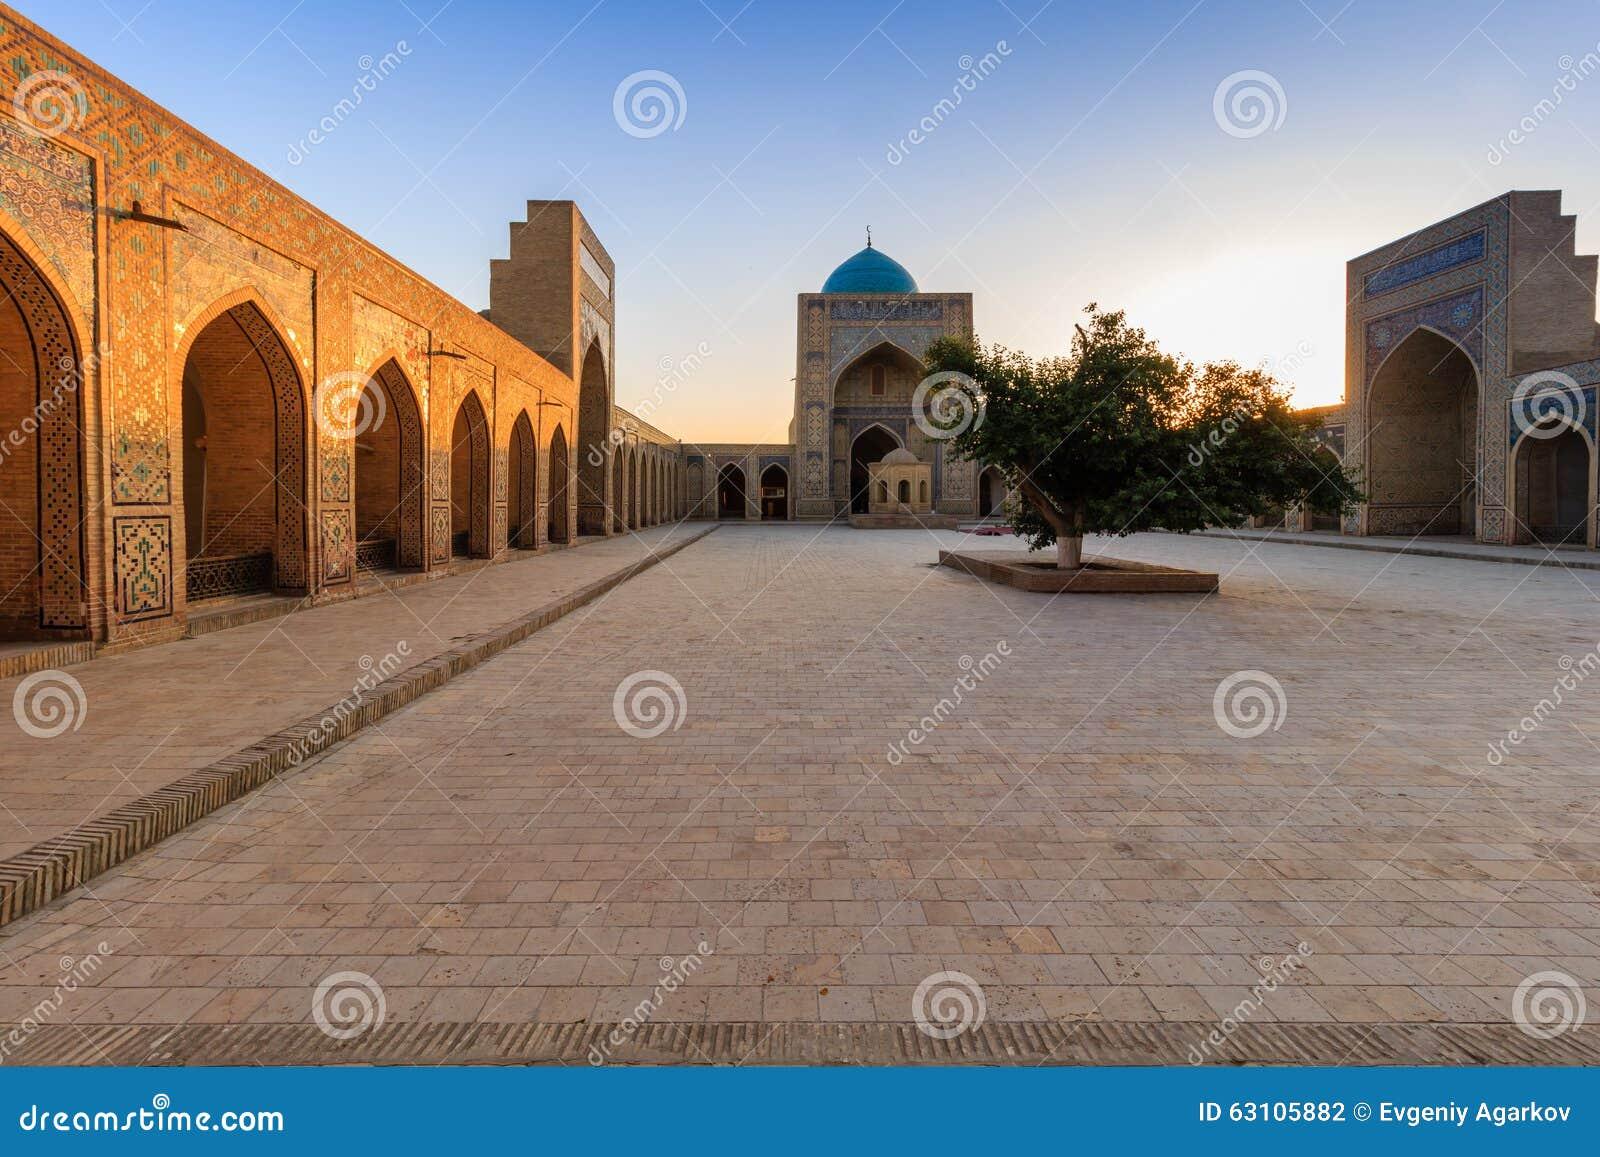 Взгляд мечети на заходе солнца, Бухары Kolon, Узбекистана